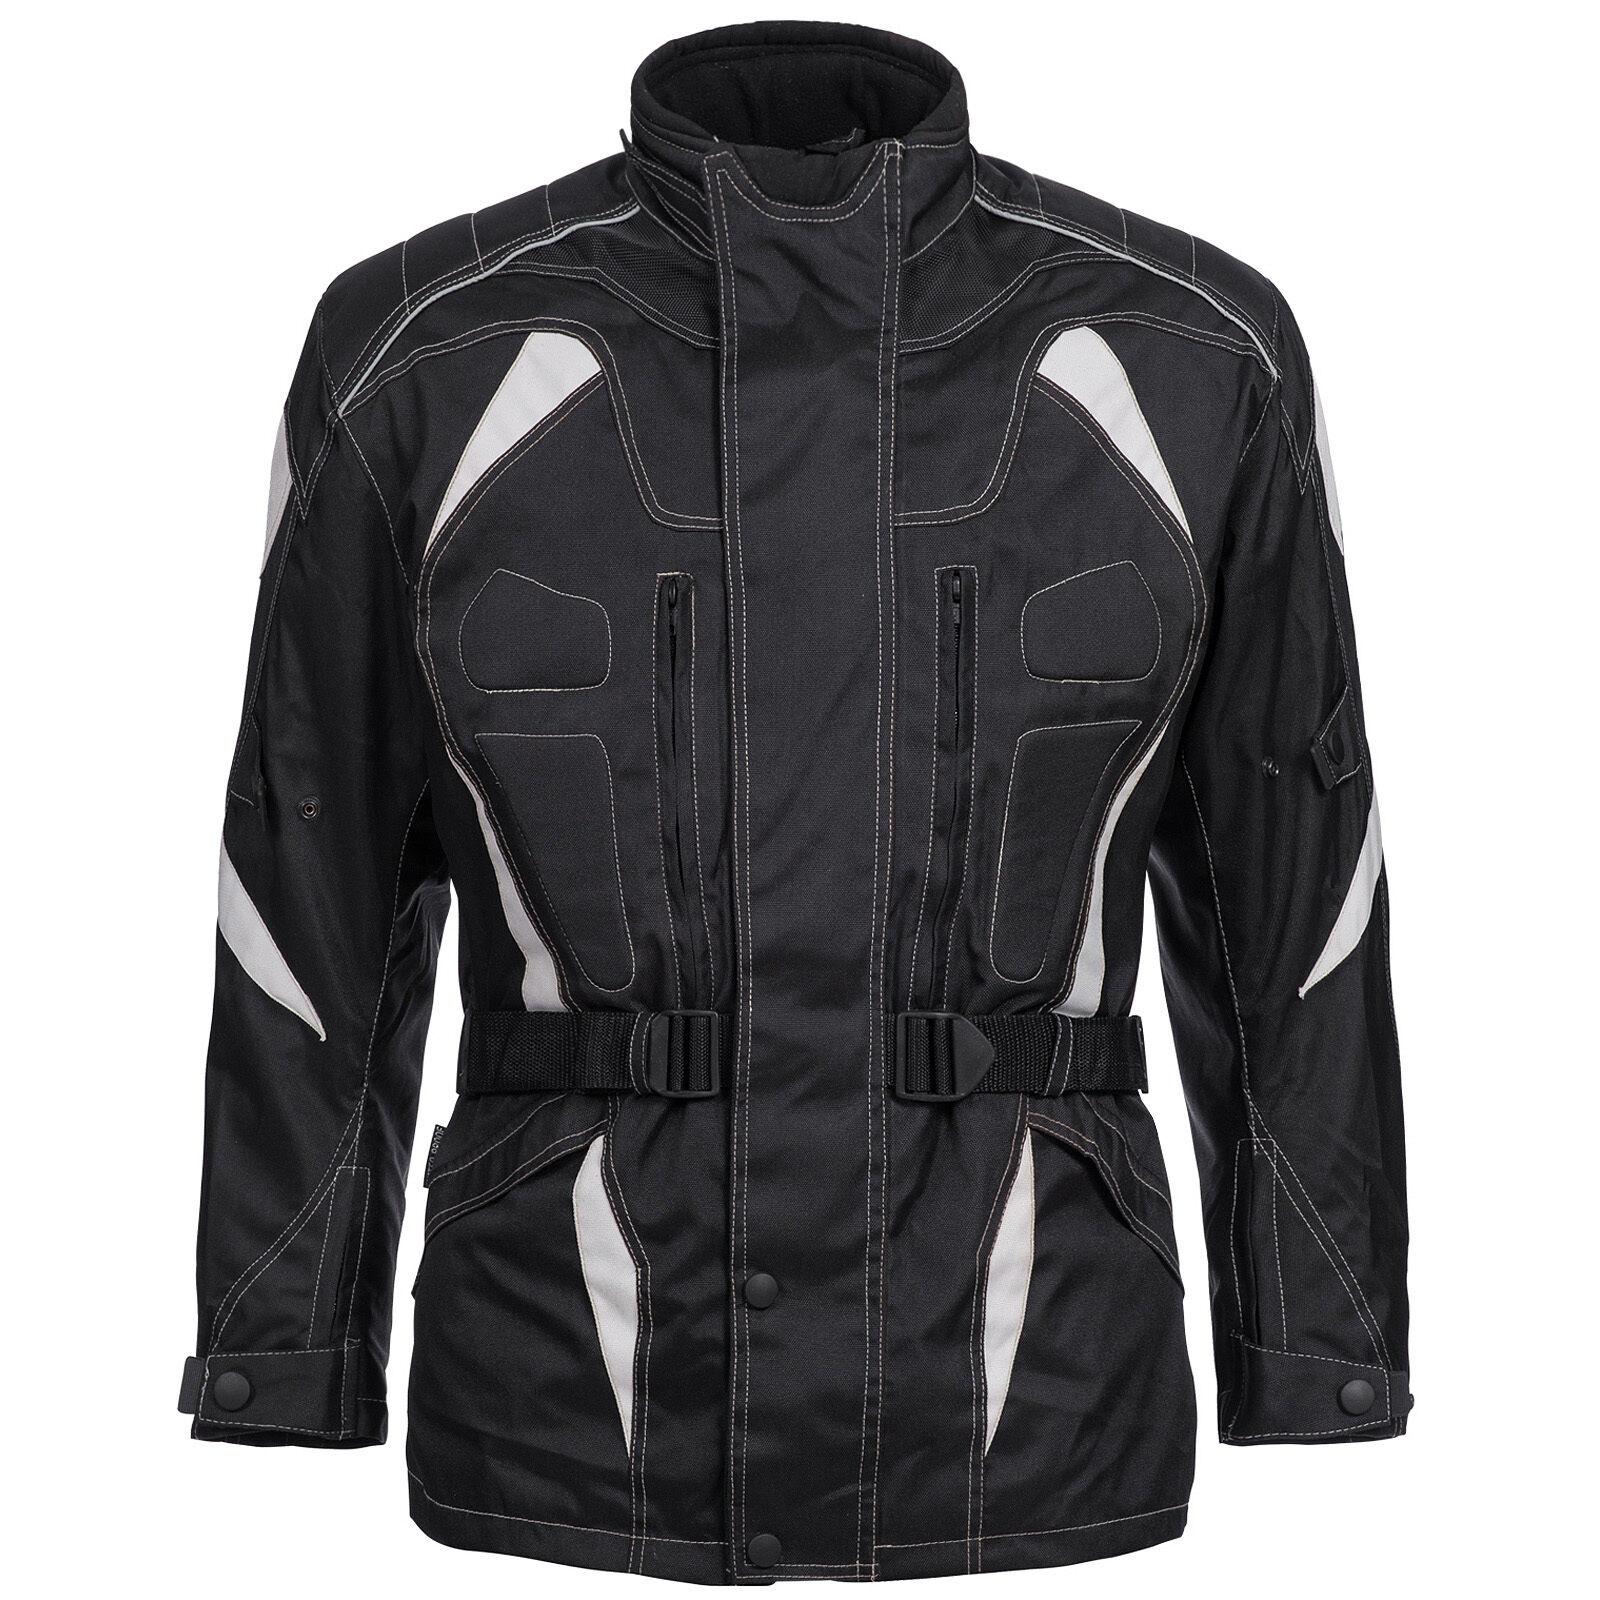 Chaqueta de MOTO Limitless Limitless Limitless Hombre Familiar textil cordura negro M – 4xl 777 eabb9c